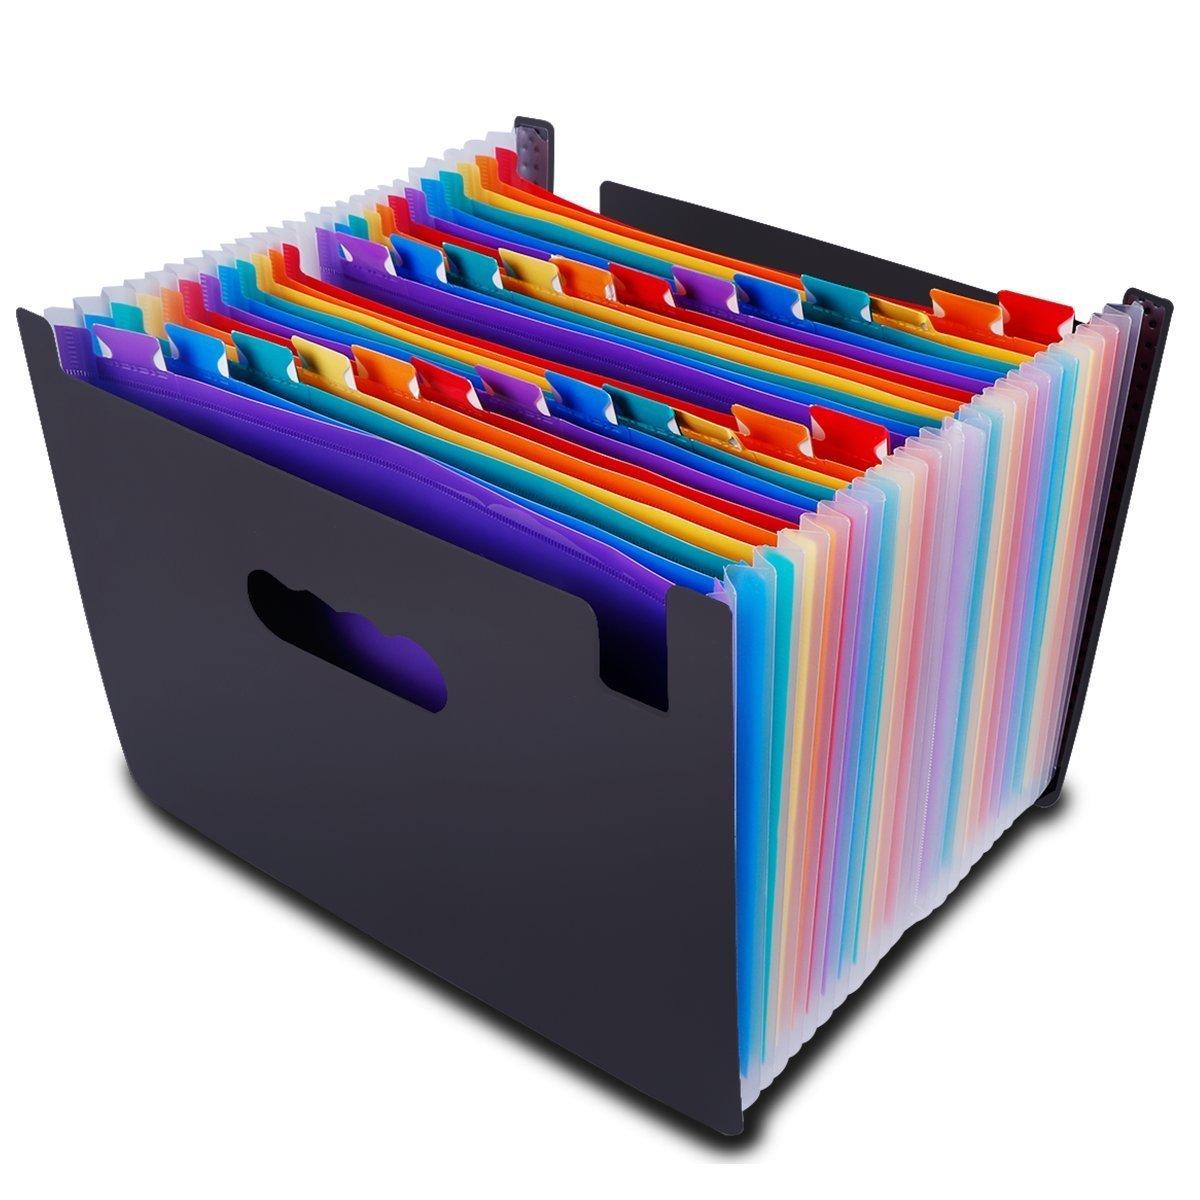 Multicolored Expandingファイルフォルダ、/a4拡張可能なファイルオーガナイザー/ポータブルアコーディオンファイルフォルダ/高容量マルチスタンド/プラスチックビジネスファイルオーガナイザーボックス B07BK1GYXN